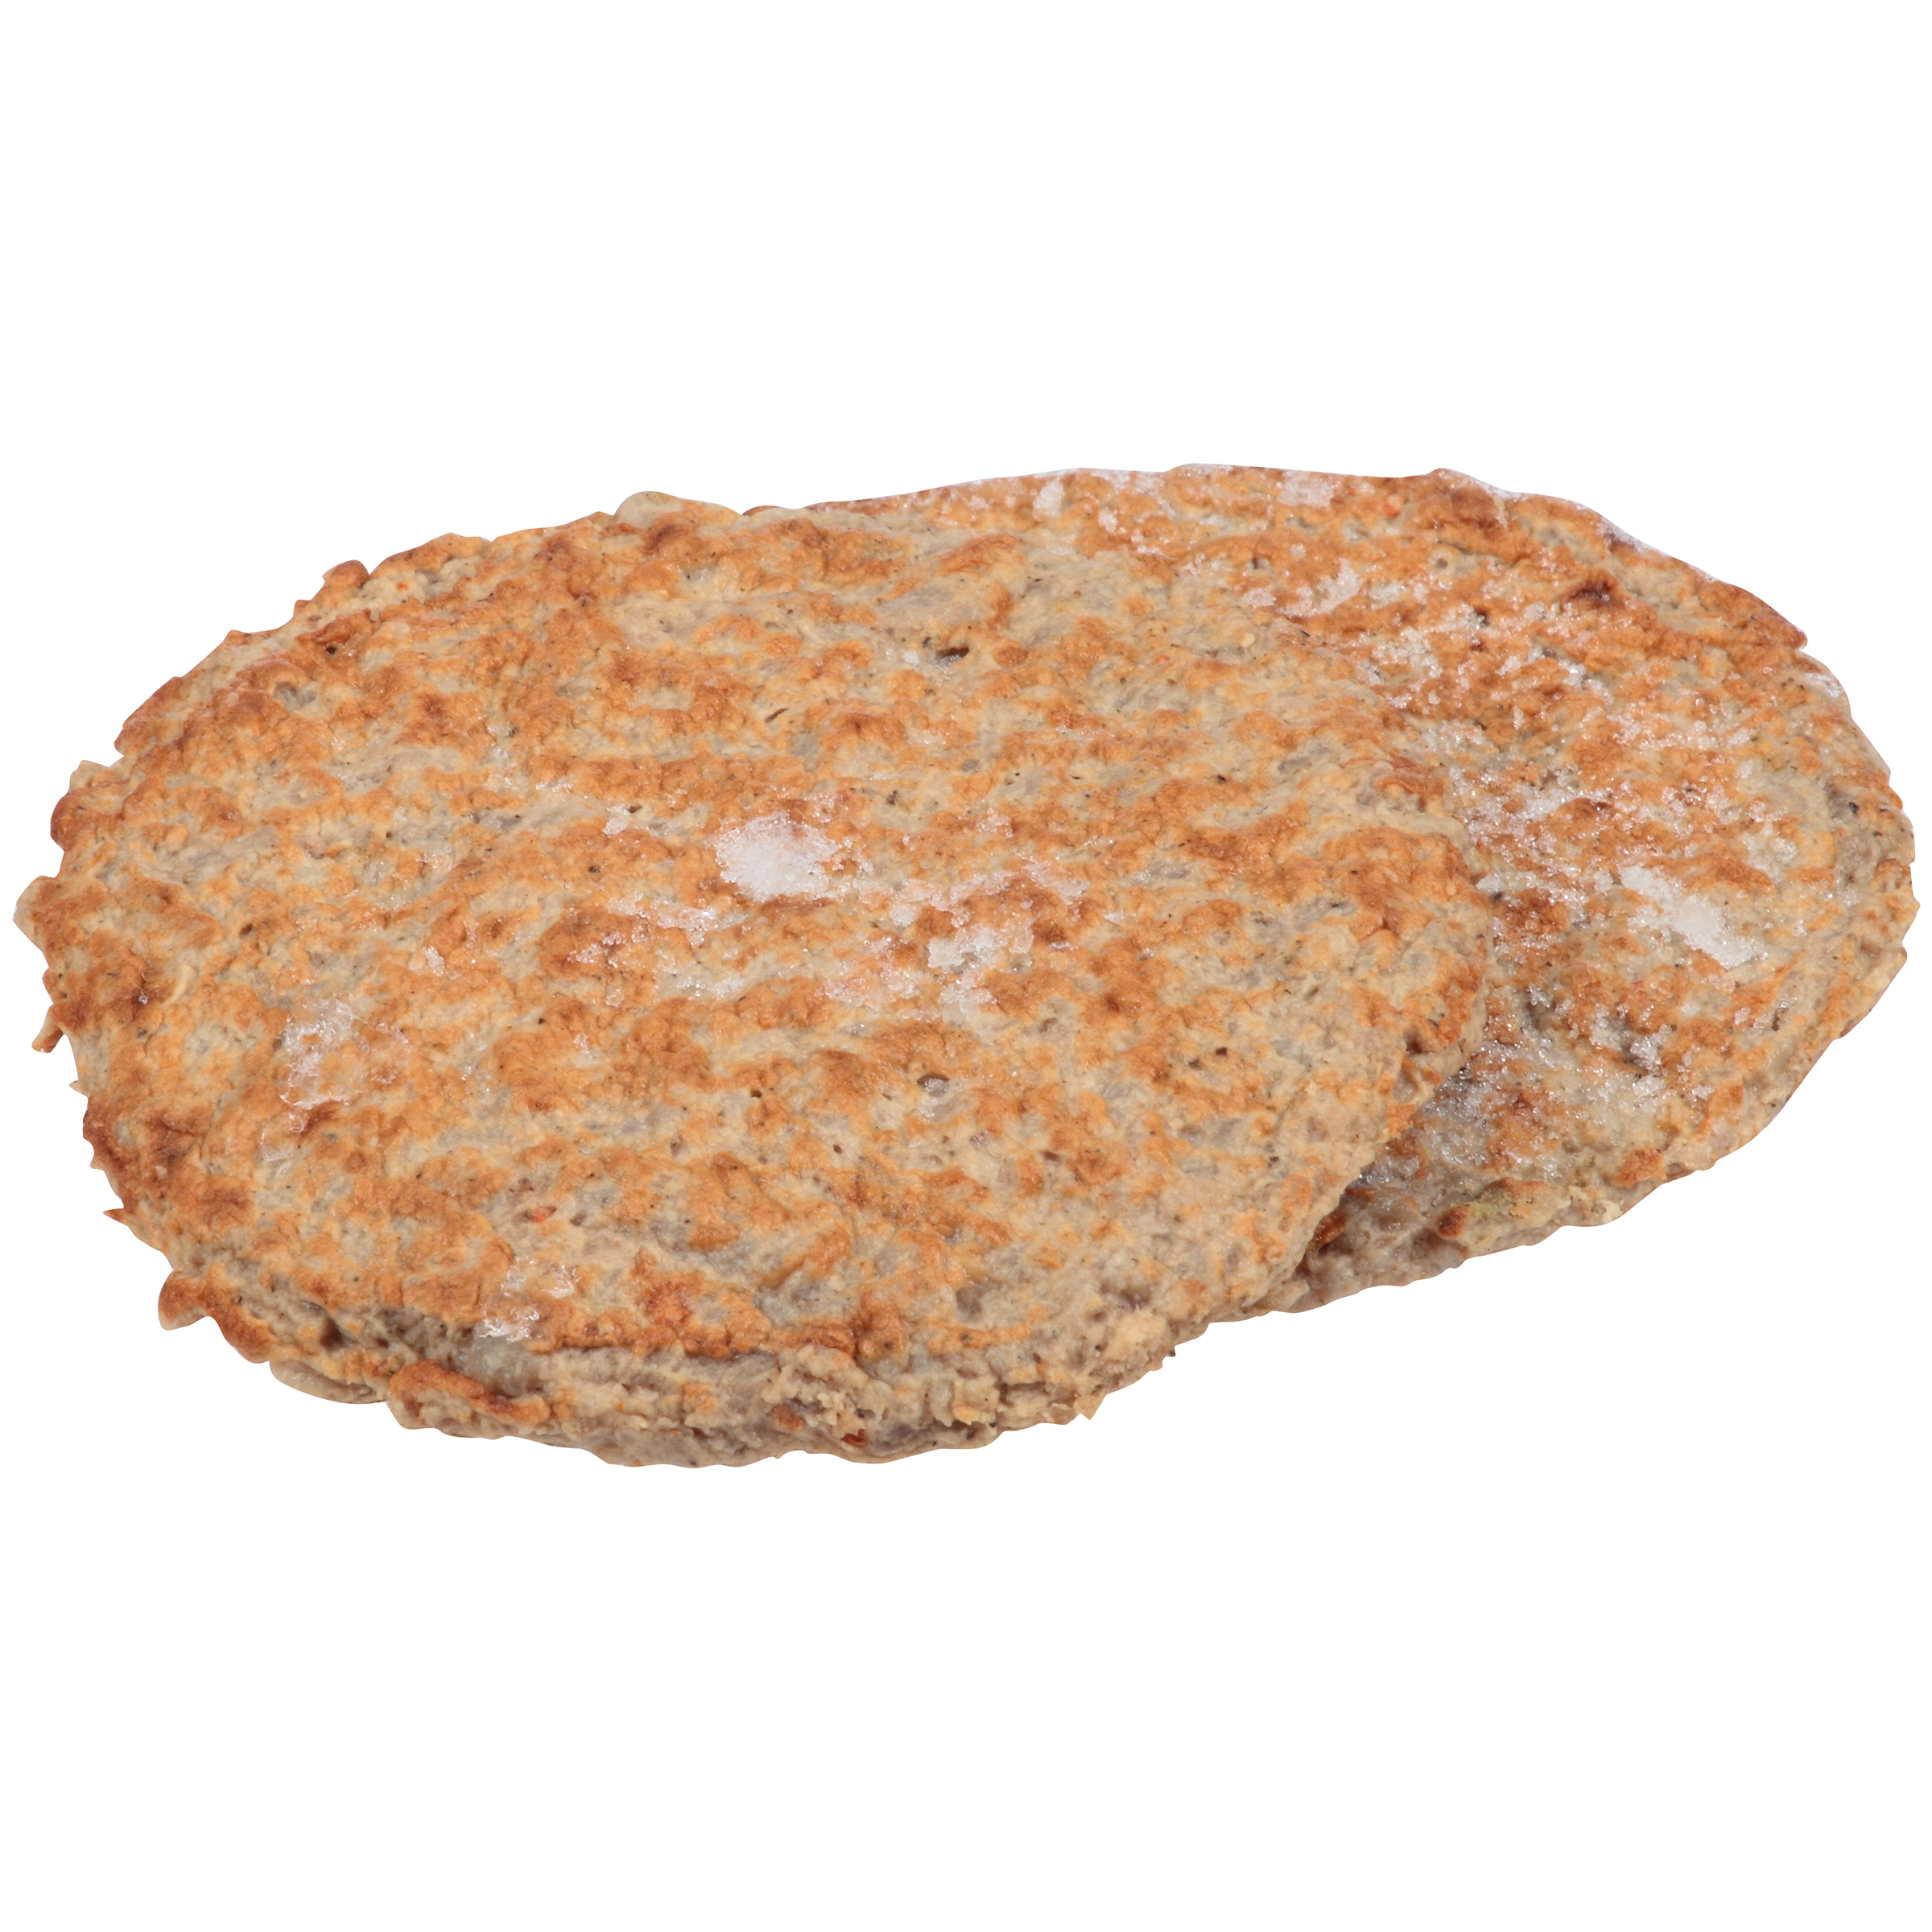 Smithfield Roll Sausage 16oz